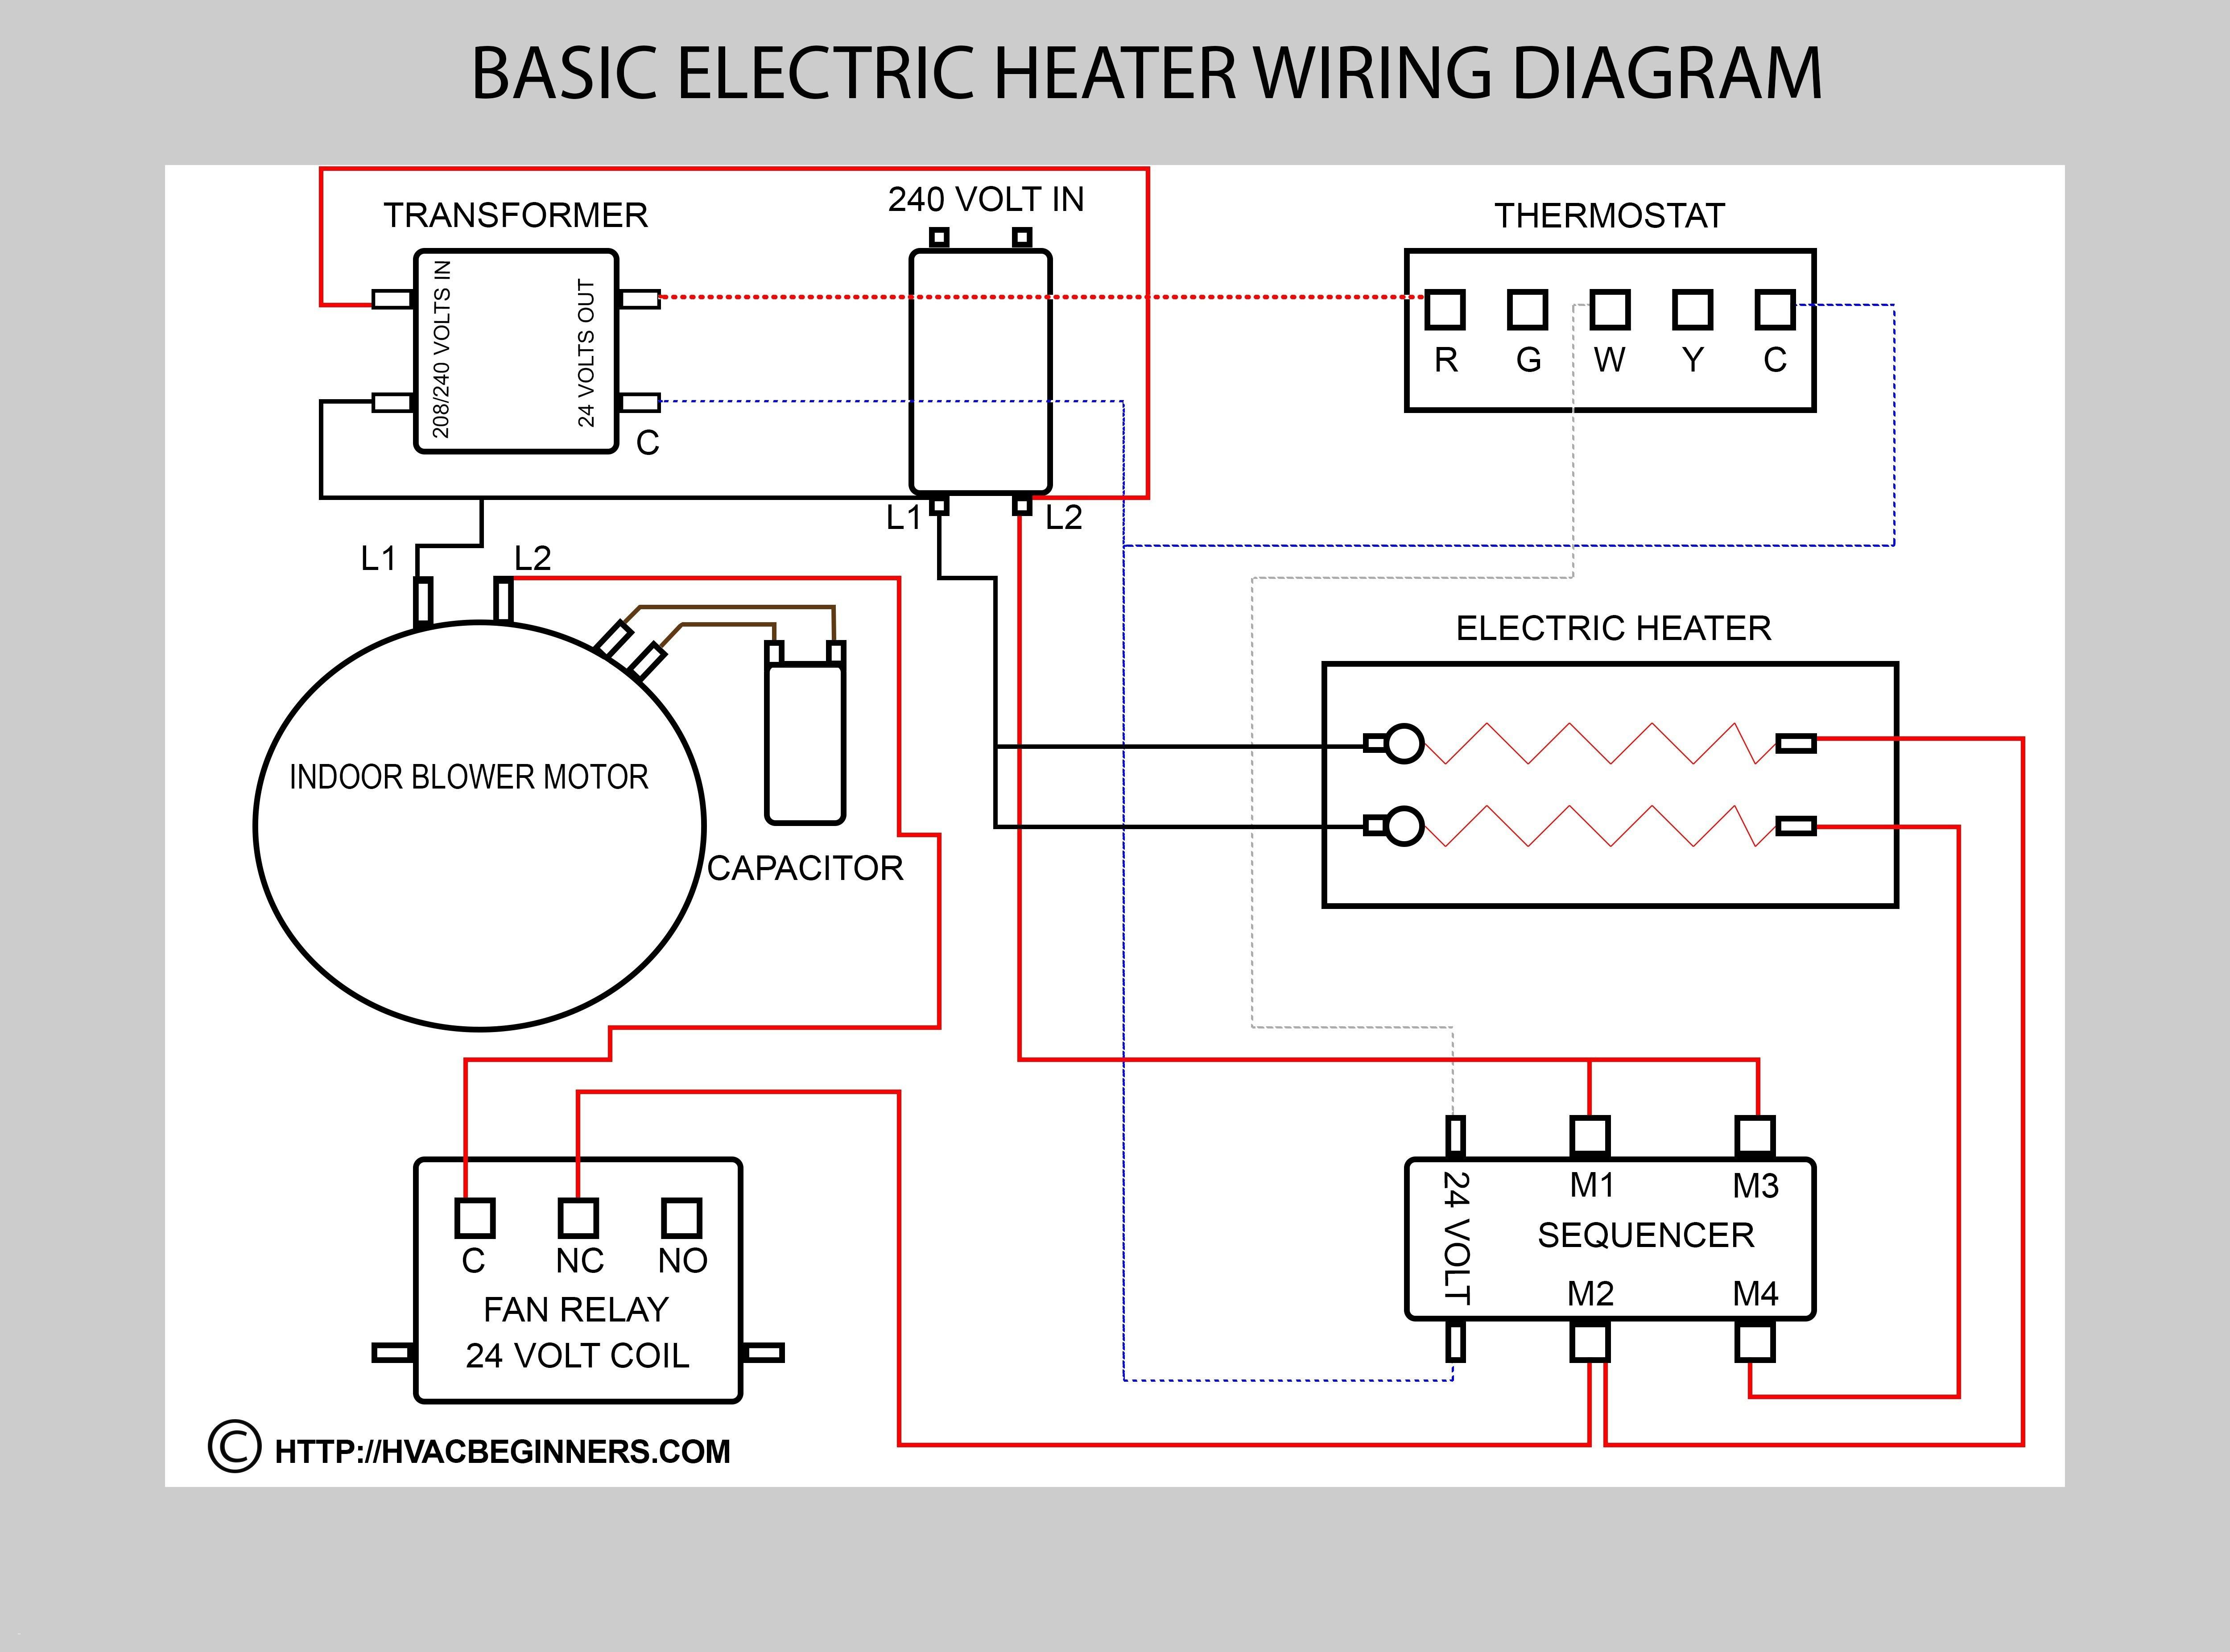 air handler fan relay wiring diagram Collection-Wiring Diagram Fan Relay Refrence Fan Relay Wiring Diagram Unique Fan Relay Wiring Diagram Hvac Wiring 20-o